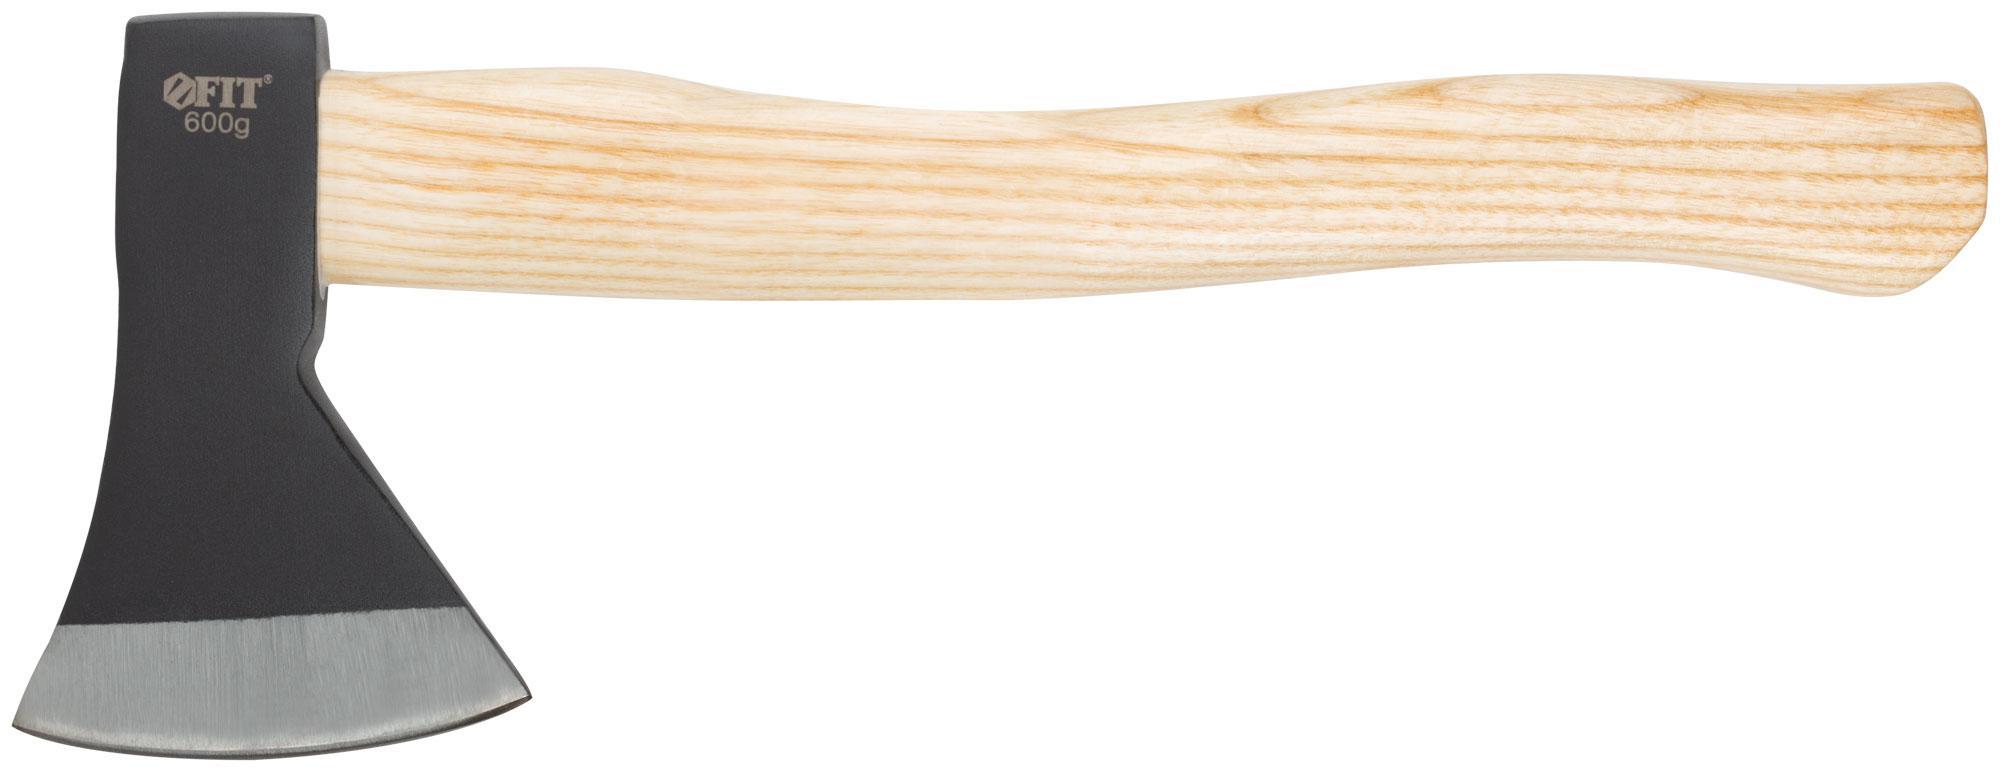 Топор FitТопоры<br>Тип топора: колун,<br>Материал рукоятки: древесина,<br>Вес нетто: 0.6<br>